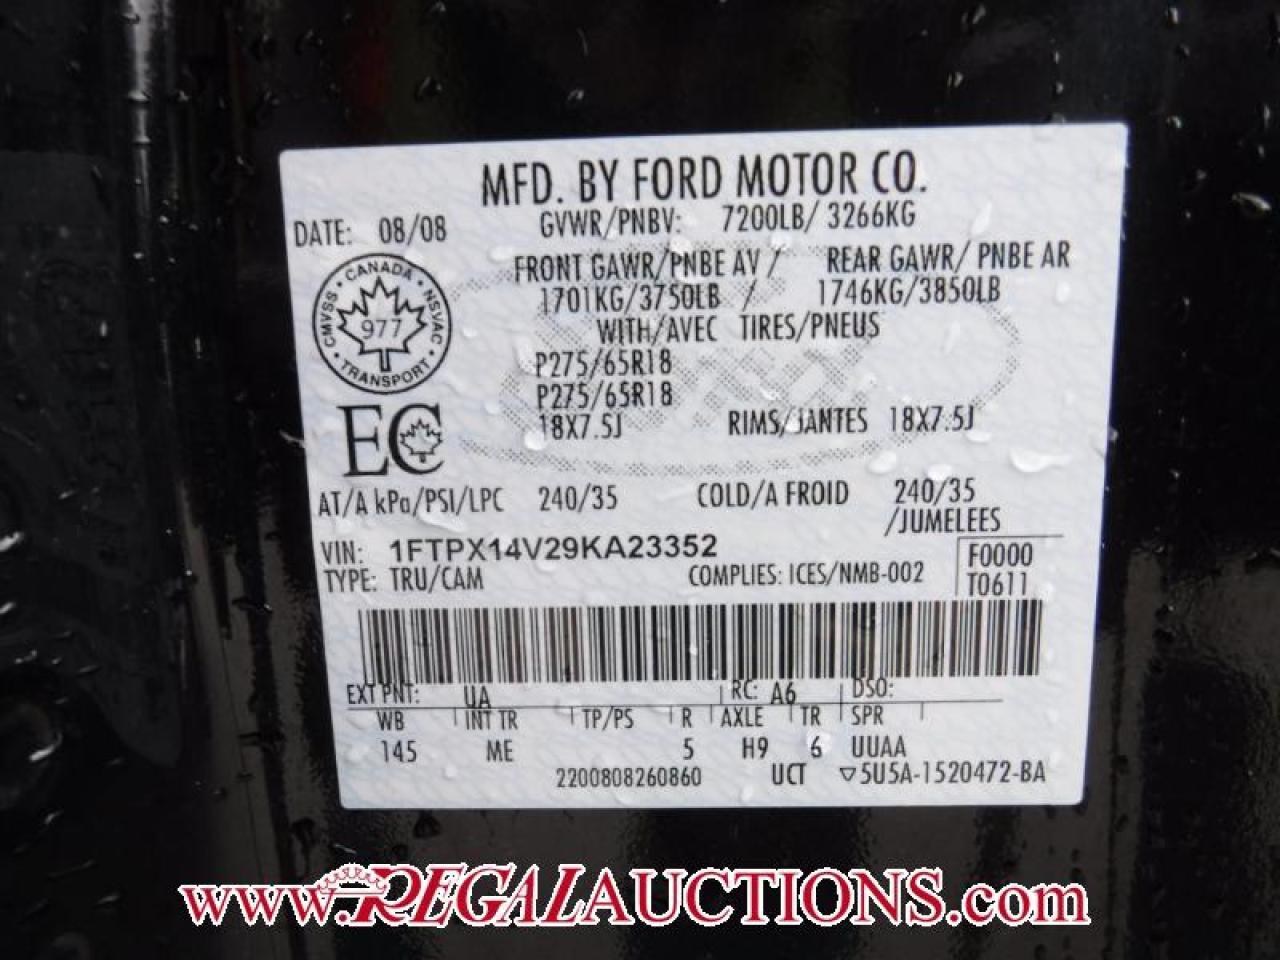 2009 Ford F-150 XLT SUPERCAB 4WD